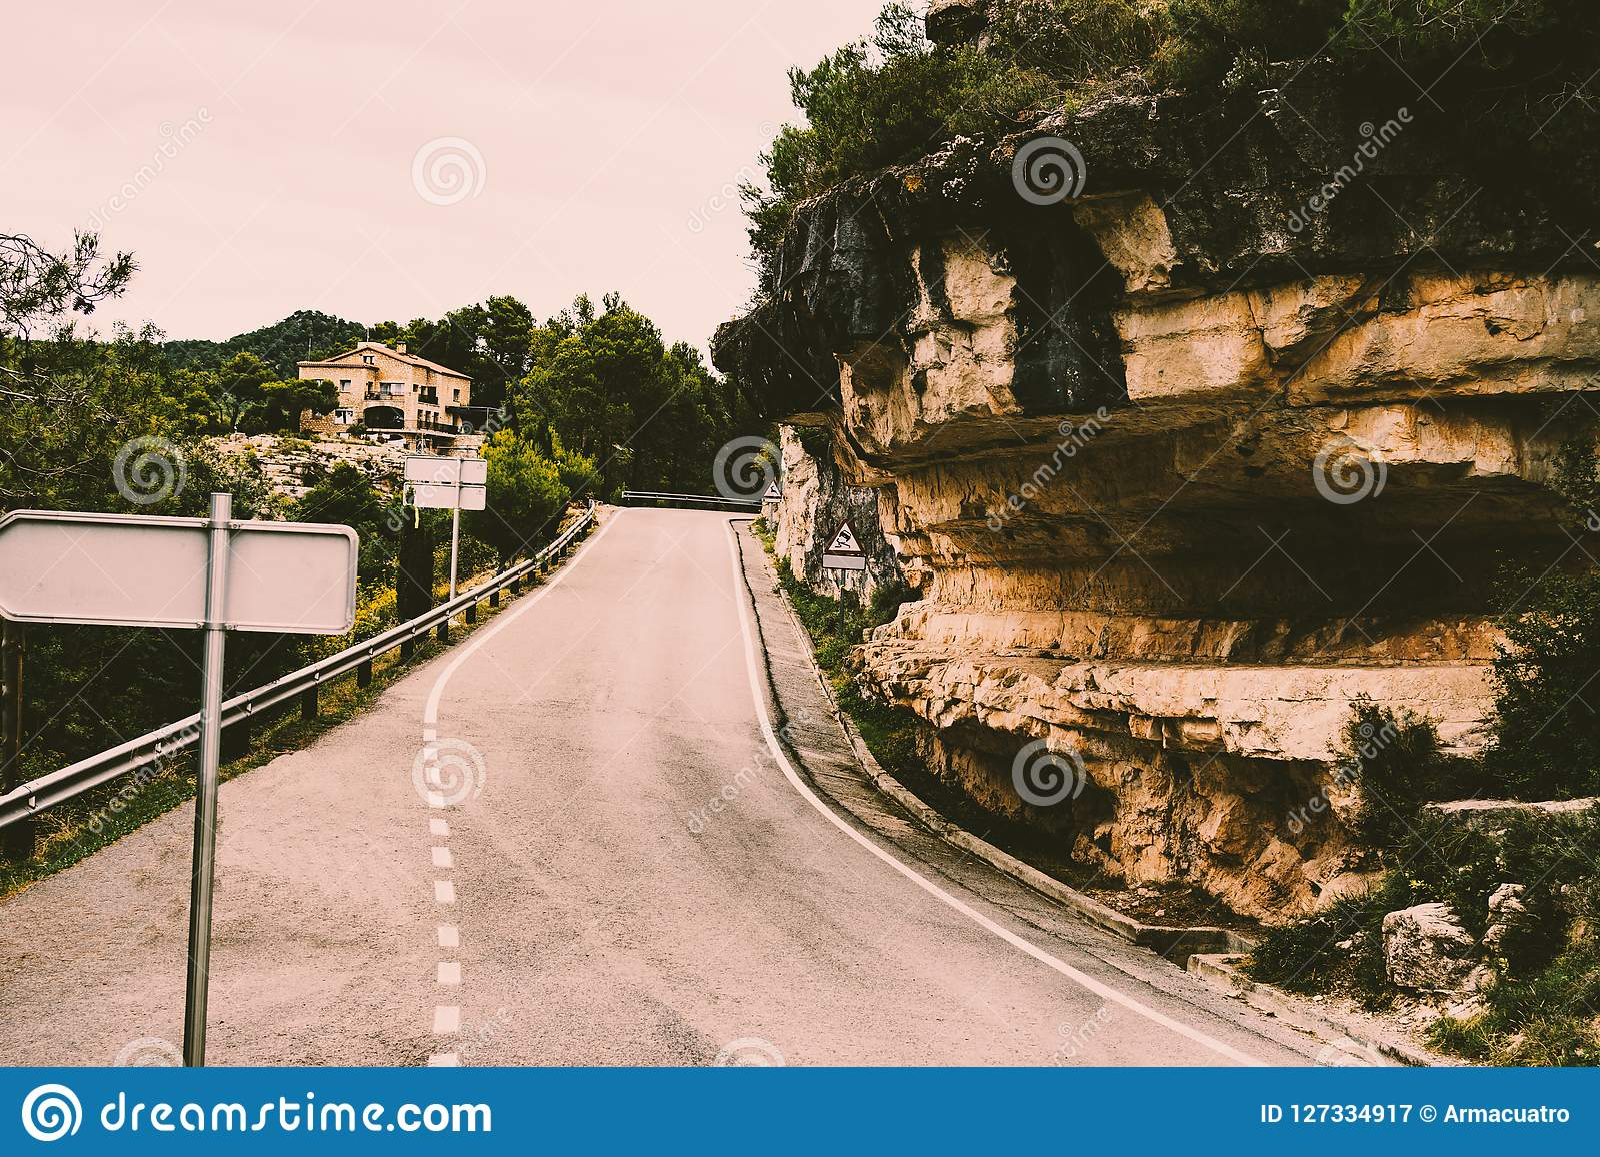 Bergväg i en landsbygd av nordliga Spanien